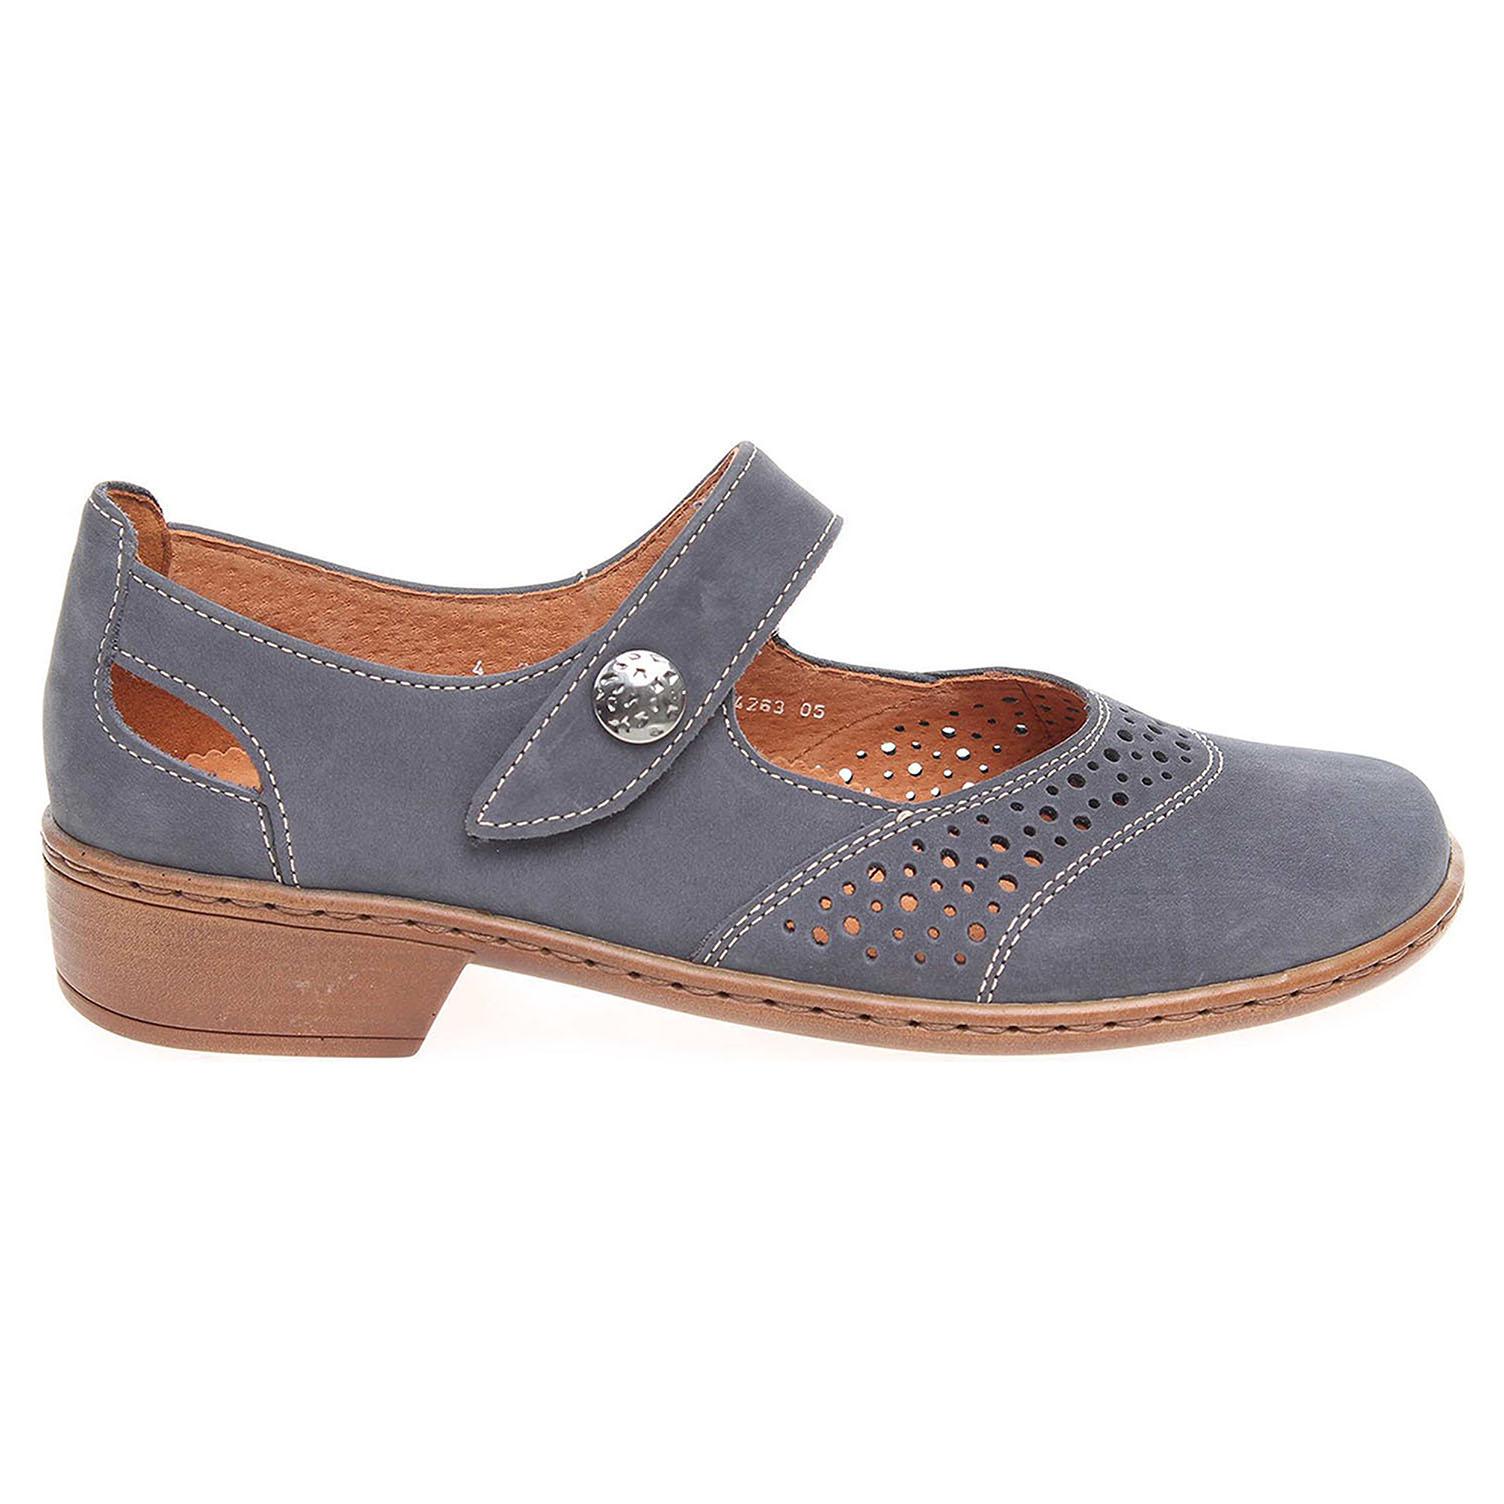 Ecco Ara dámské lodičky 54263-05 modré 22901264